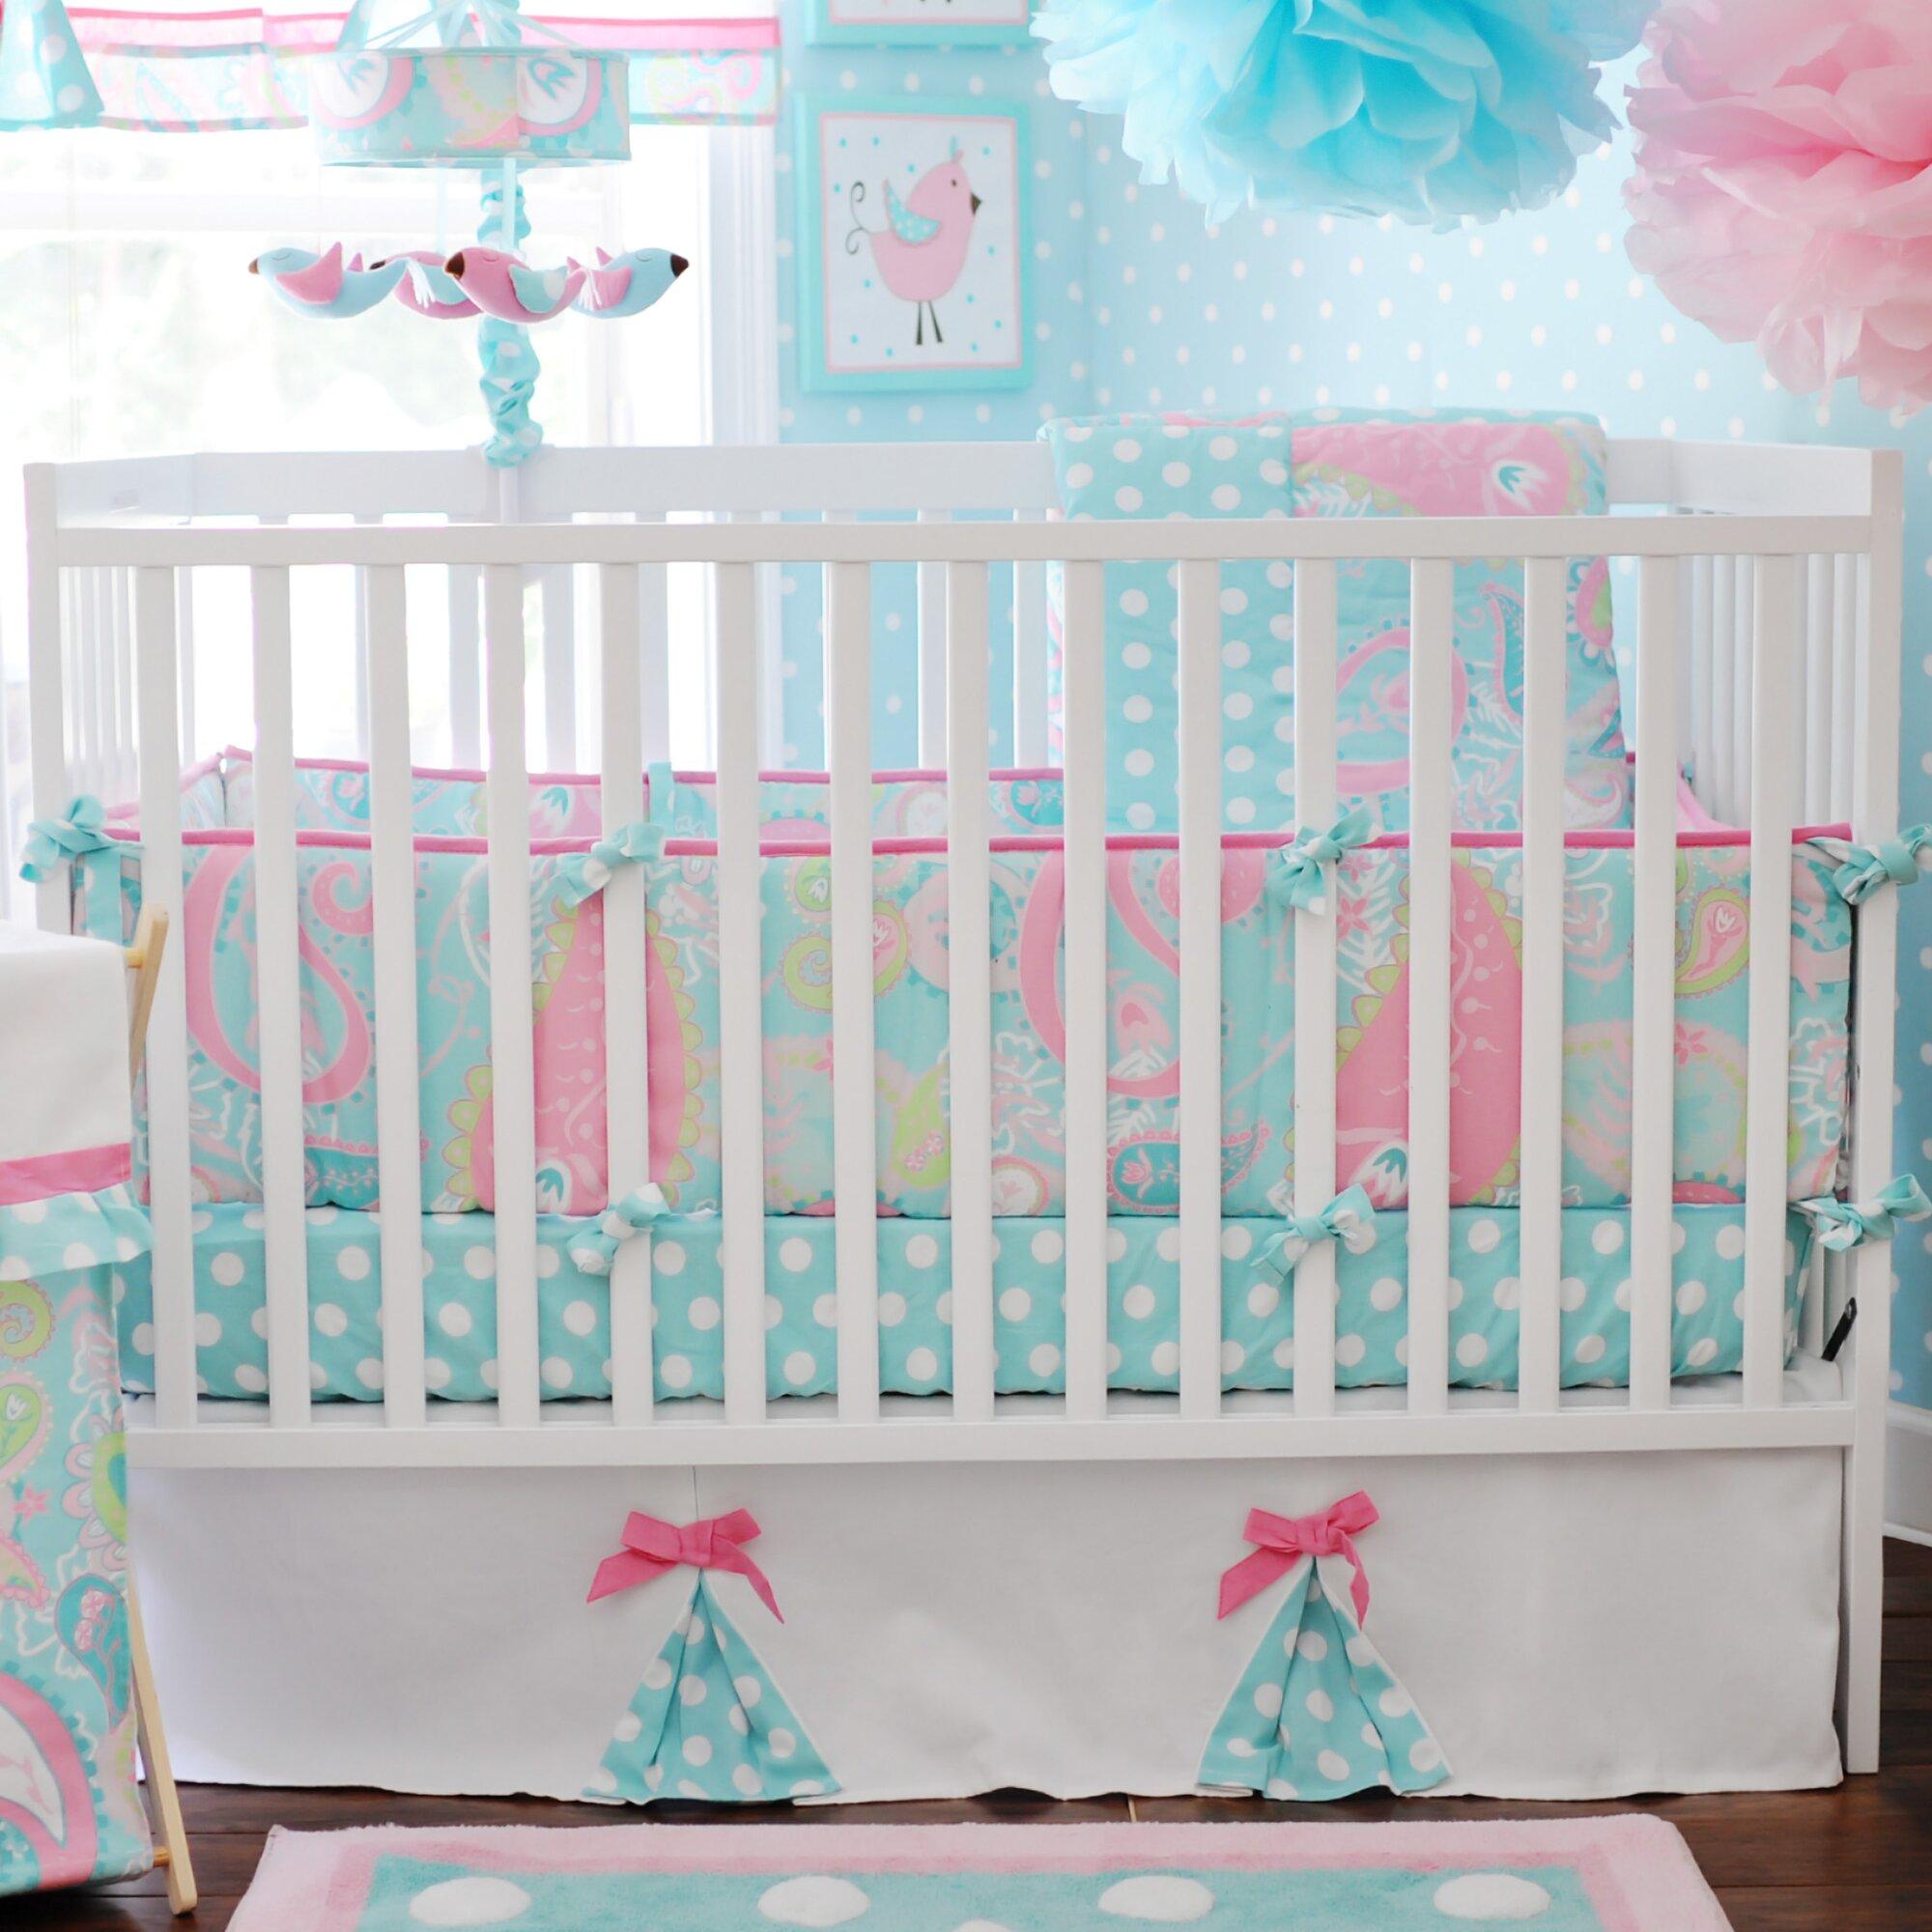 Baby bedding crib sets - Pixie Baby 3 Piece Crib Bedding Set